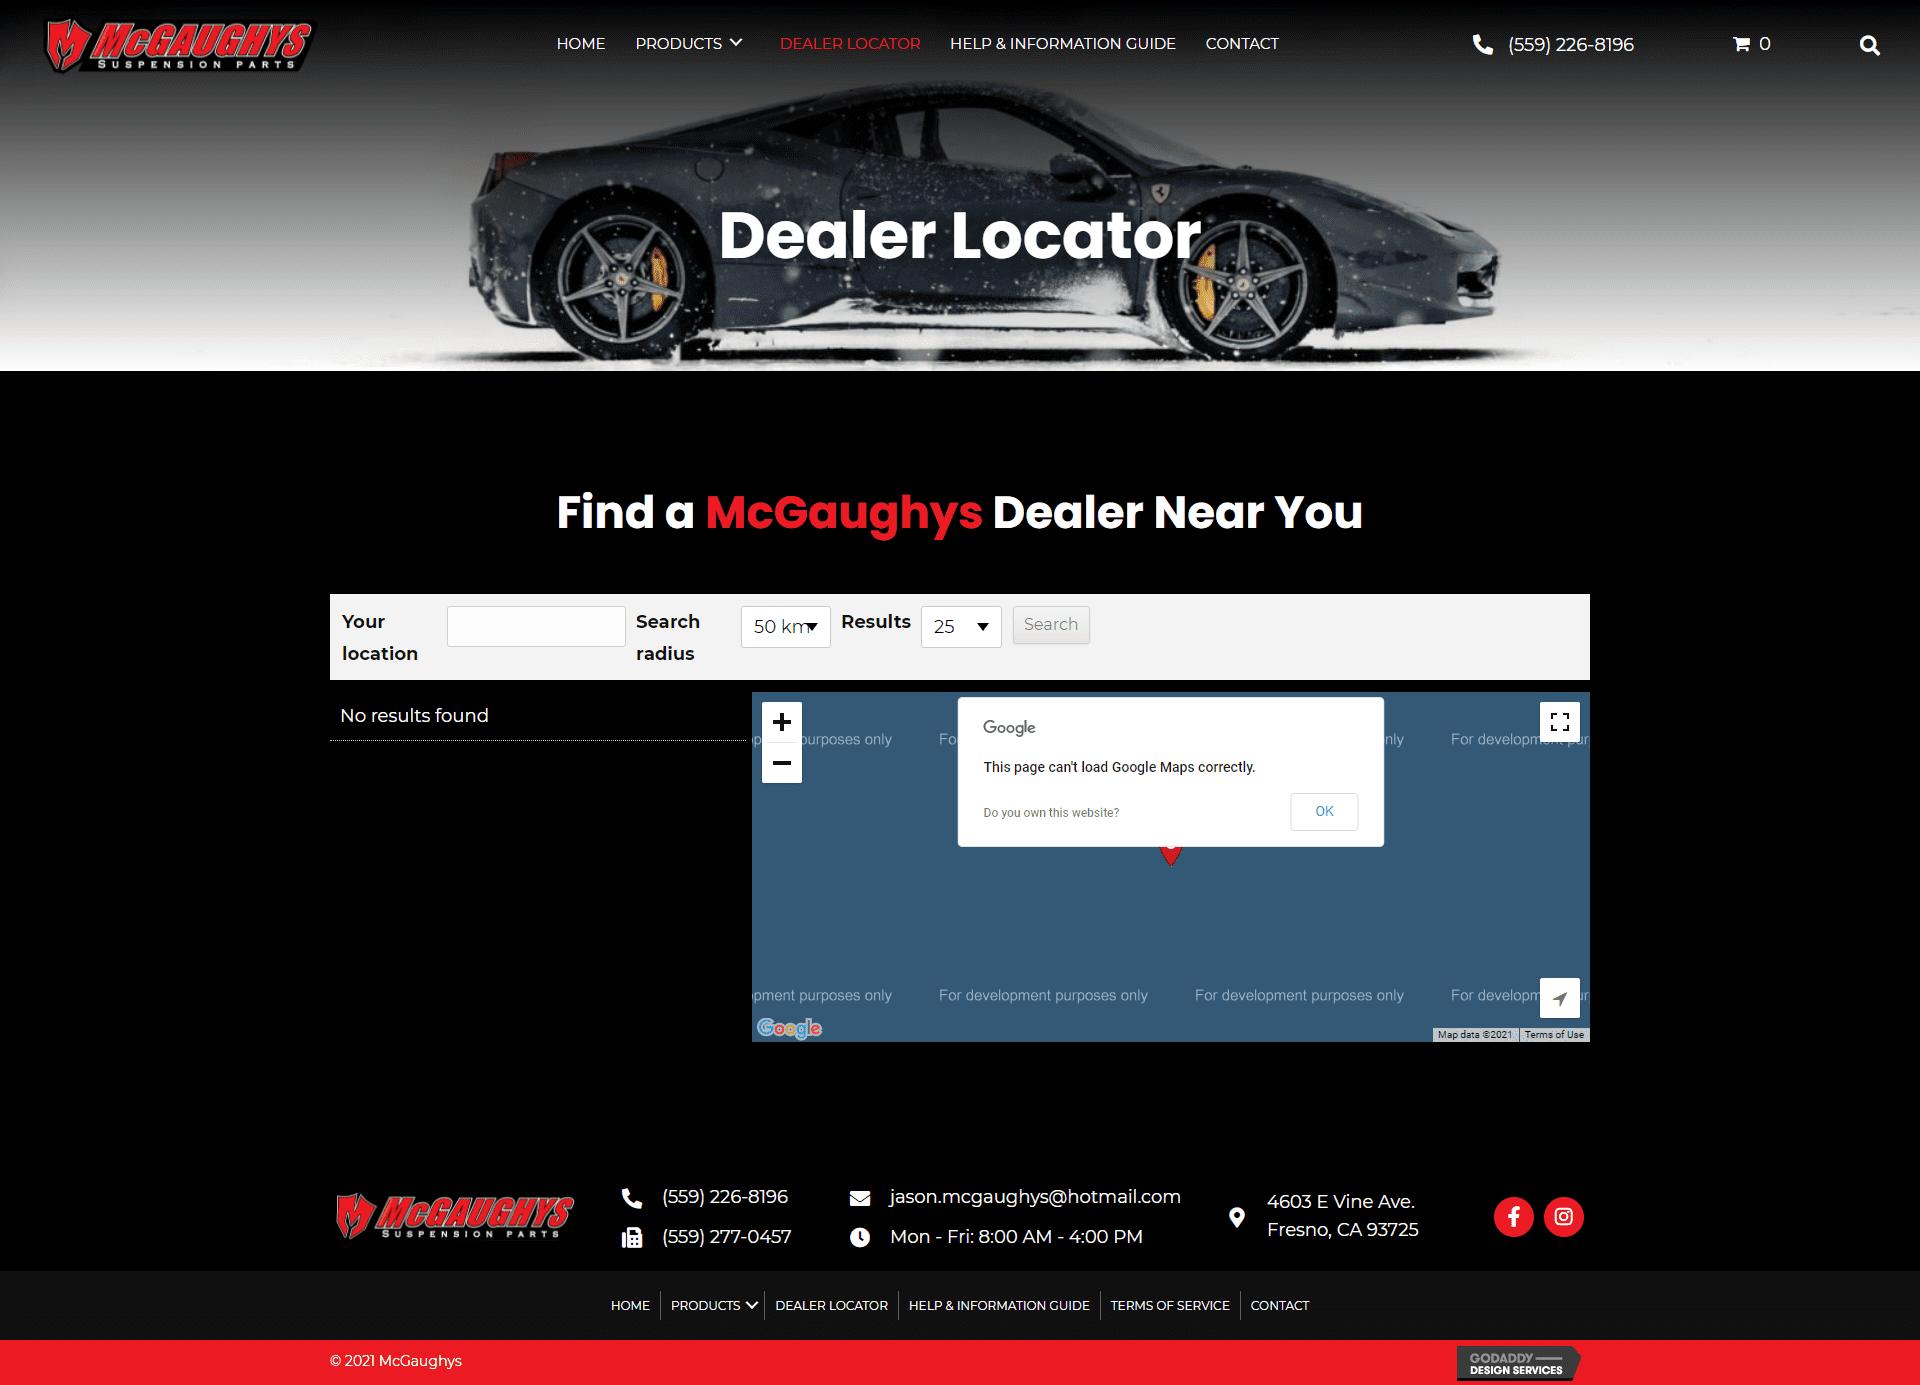 McGaughys Dealer